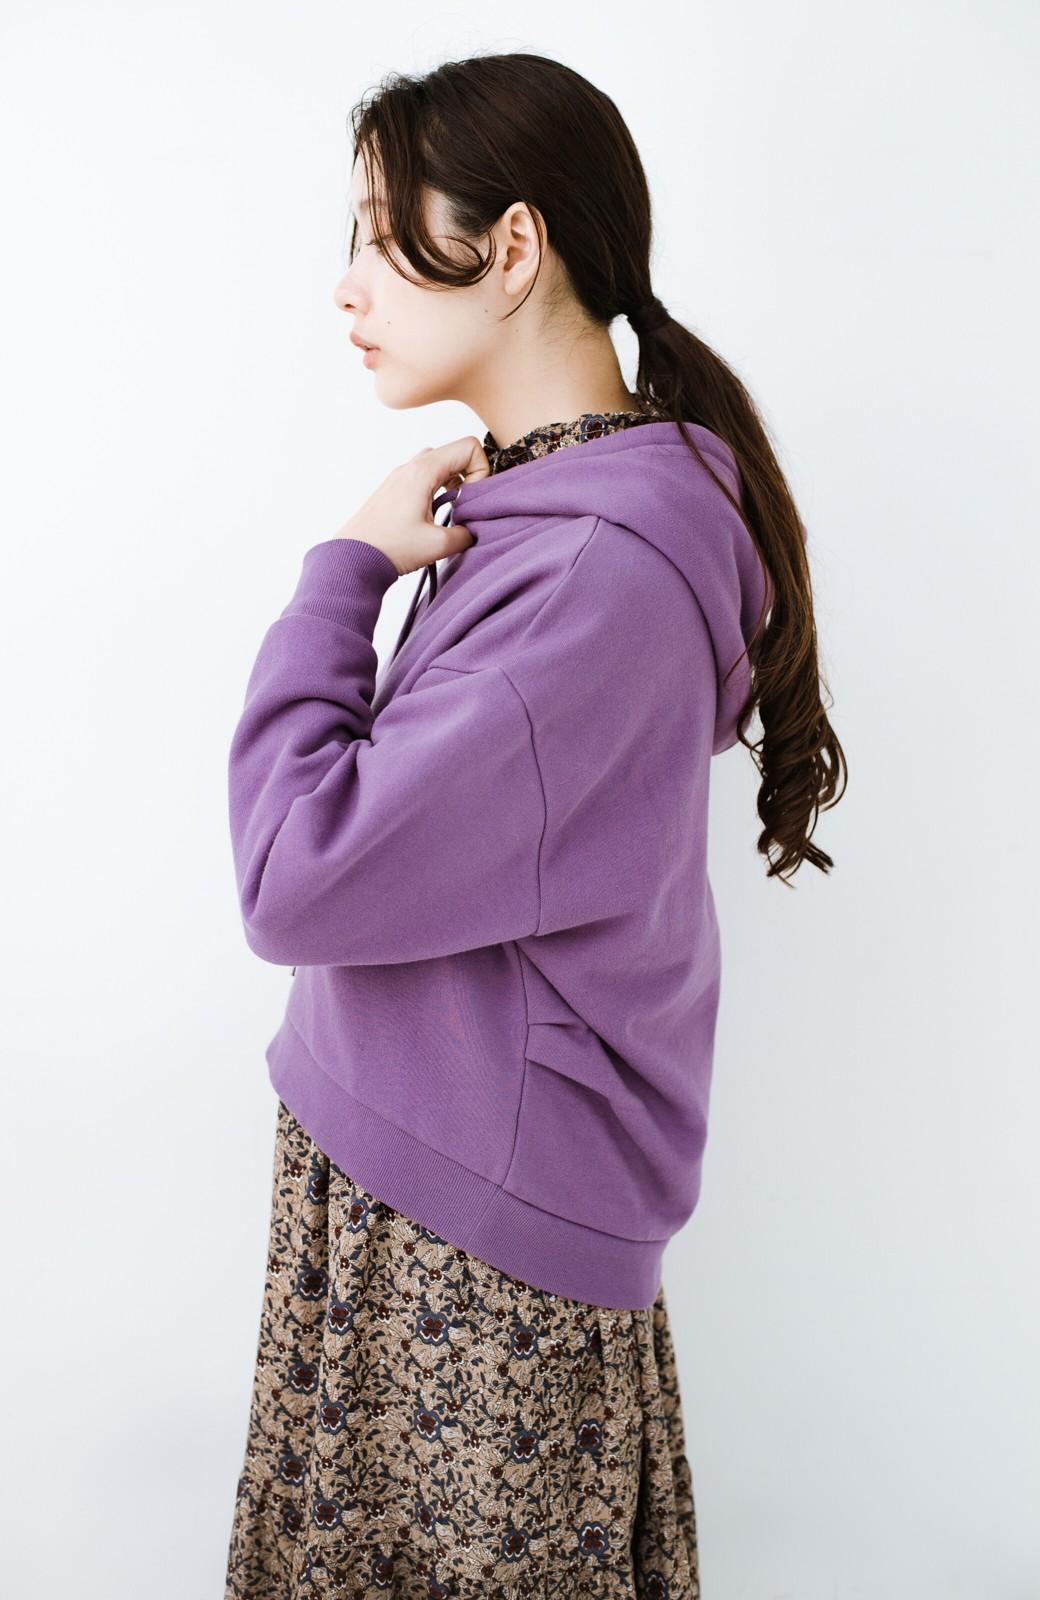 haco! PBPオーガニックコットン 短め丈でバランスよく着られる裏起毛パーカー <パープル>の商品写真17